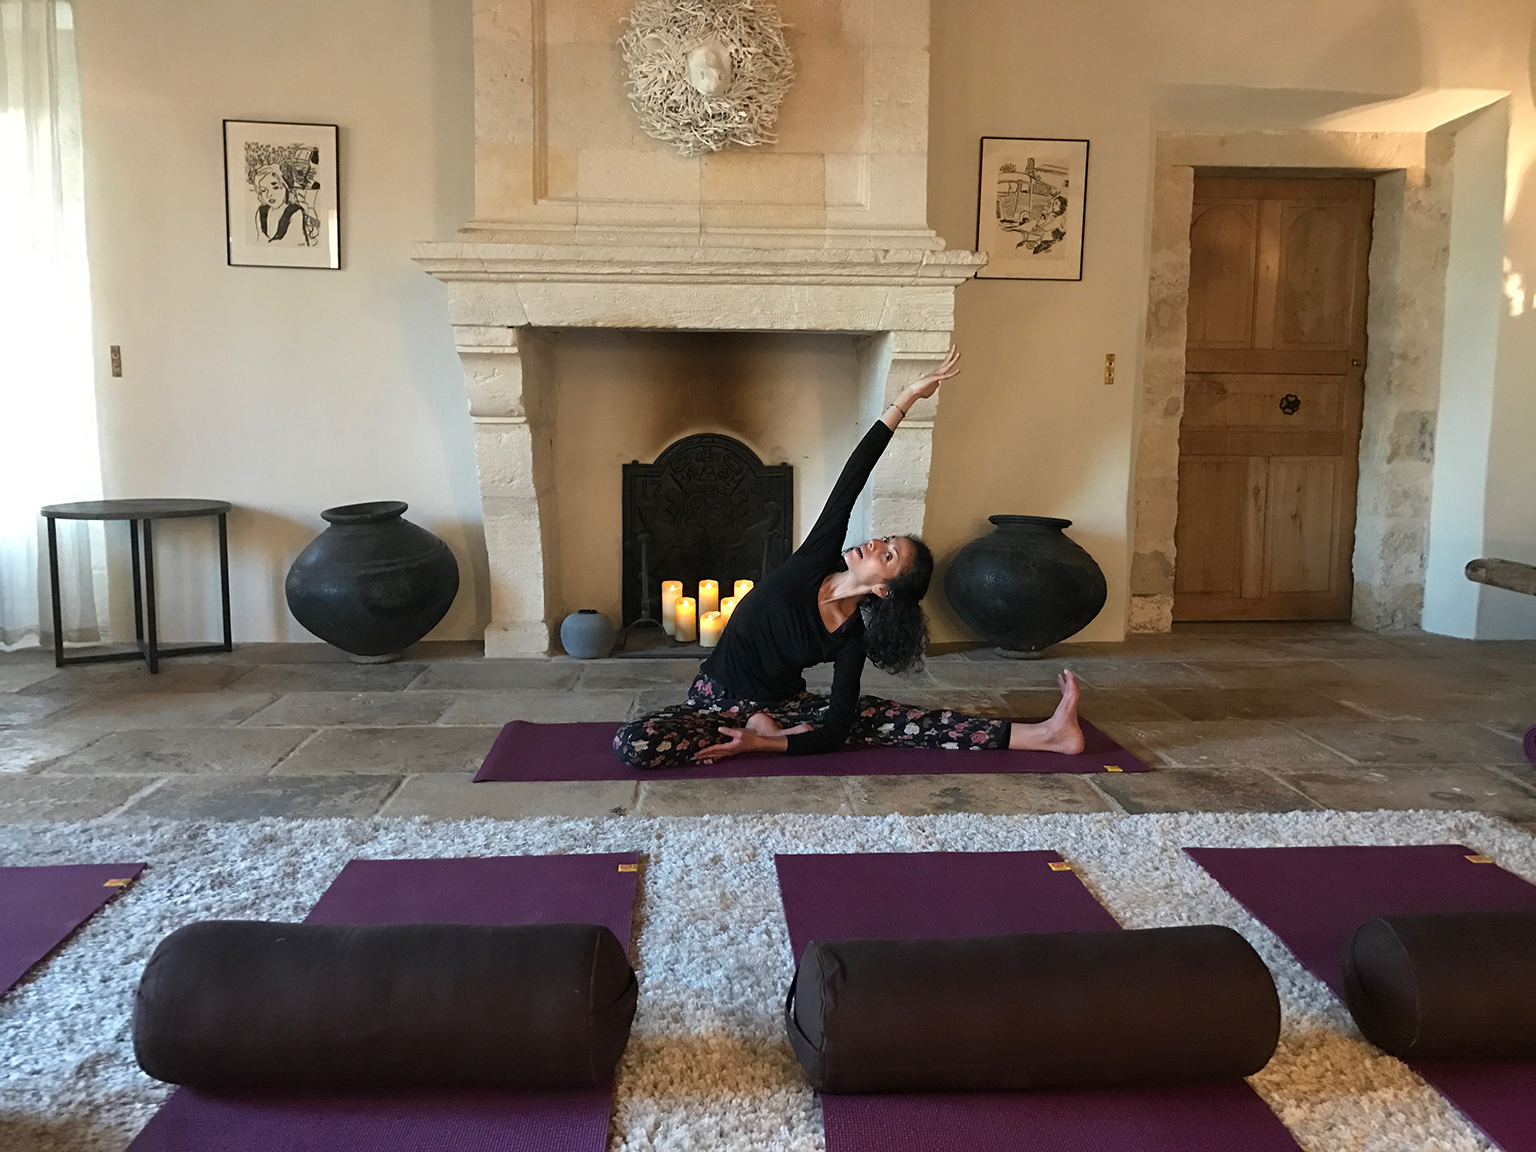 Séance de yoga au grand air avec Tatiana Burstein